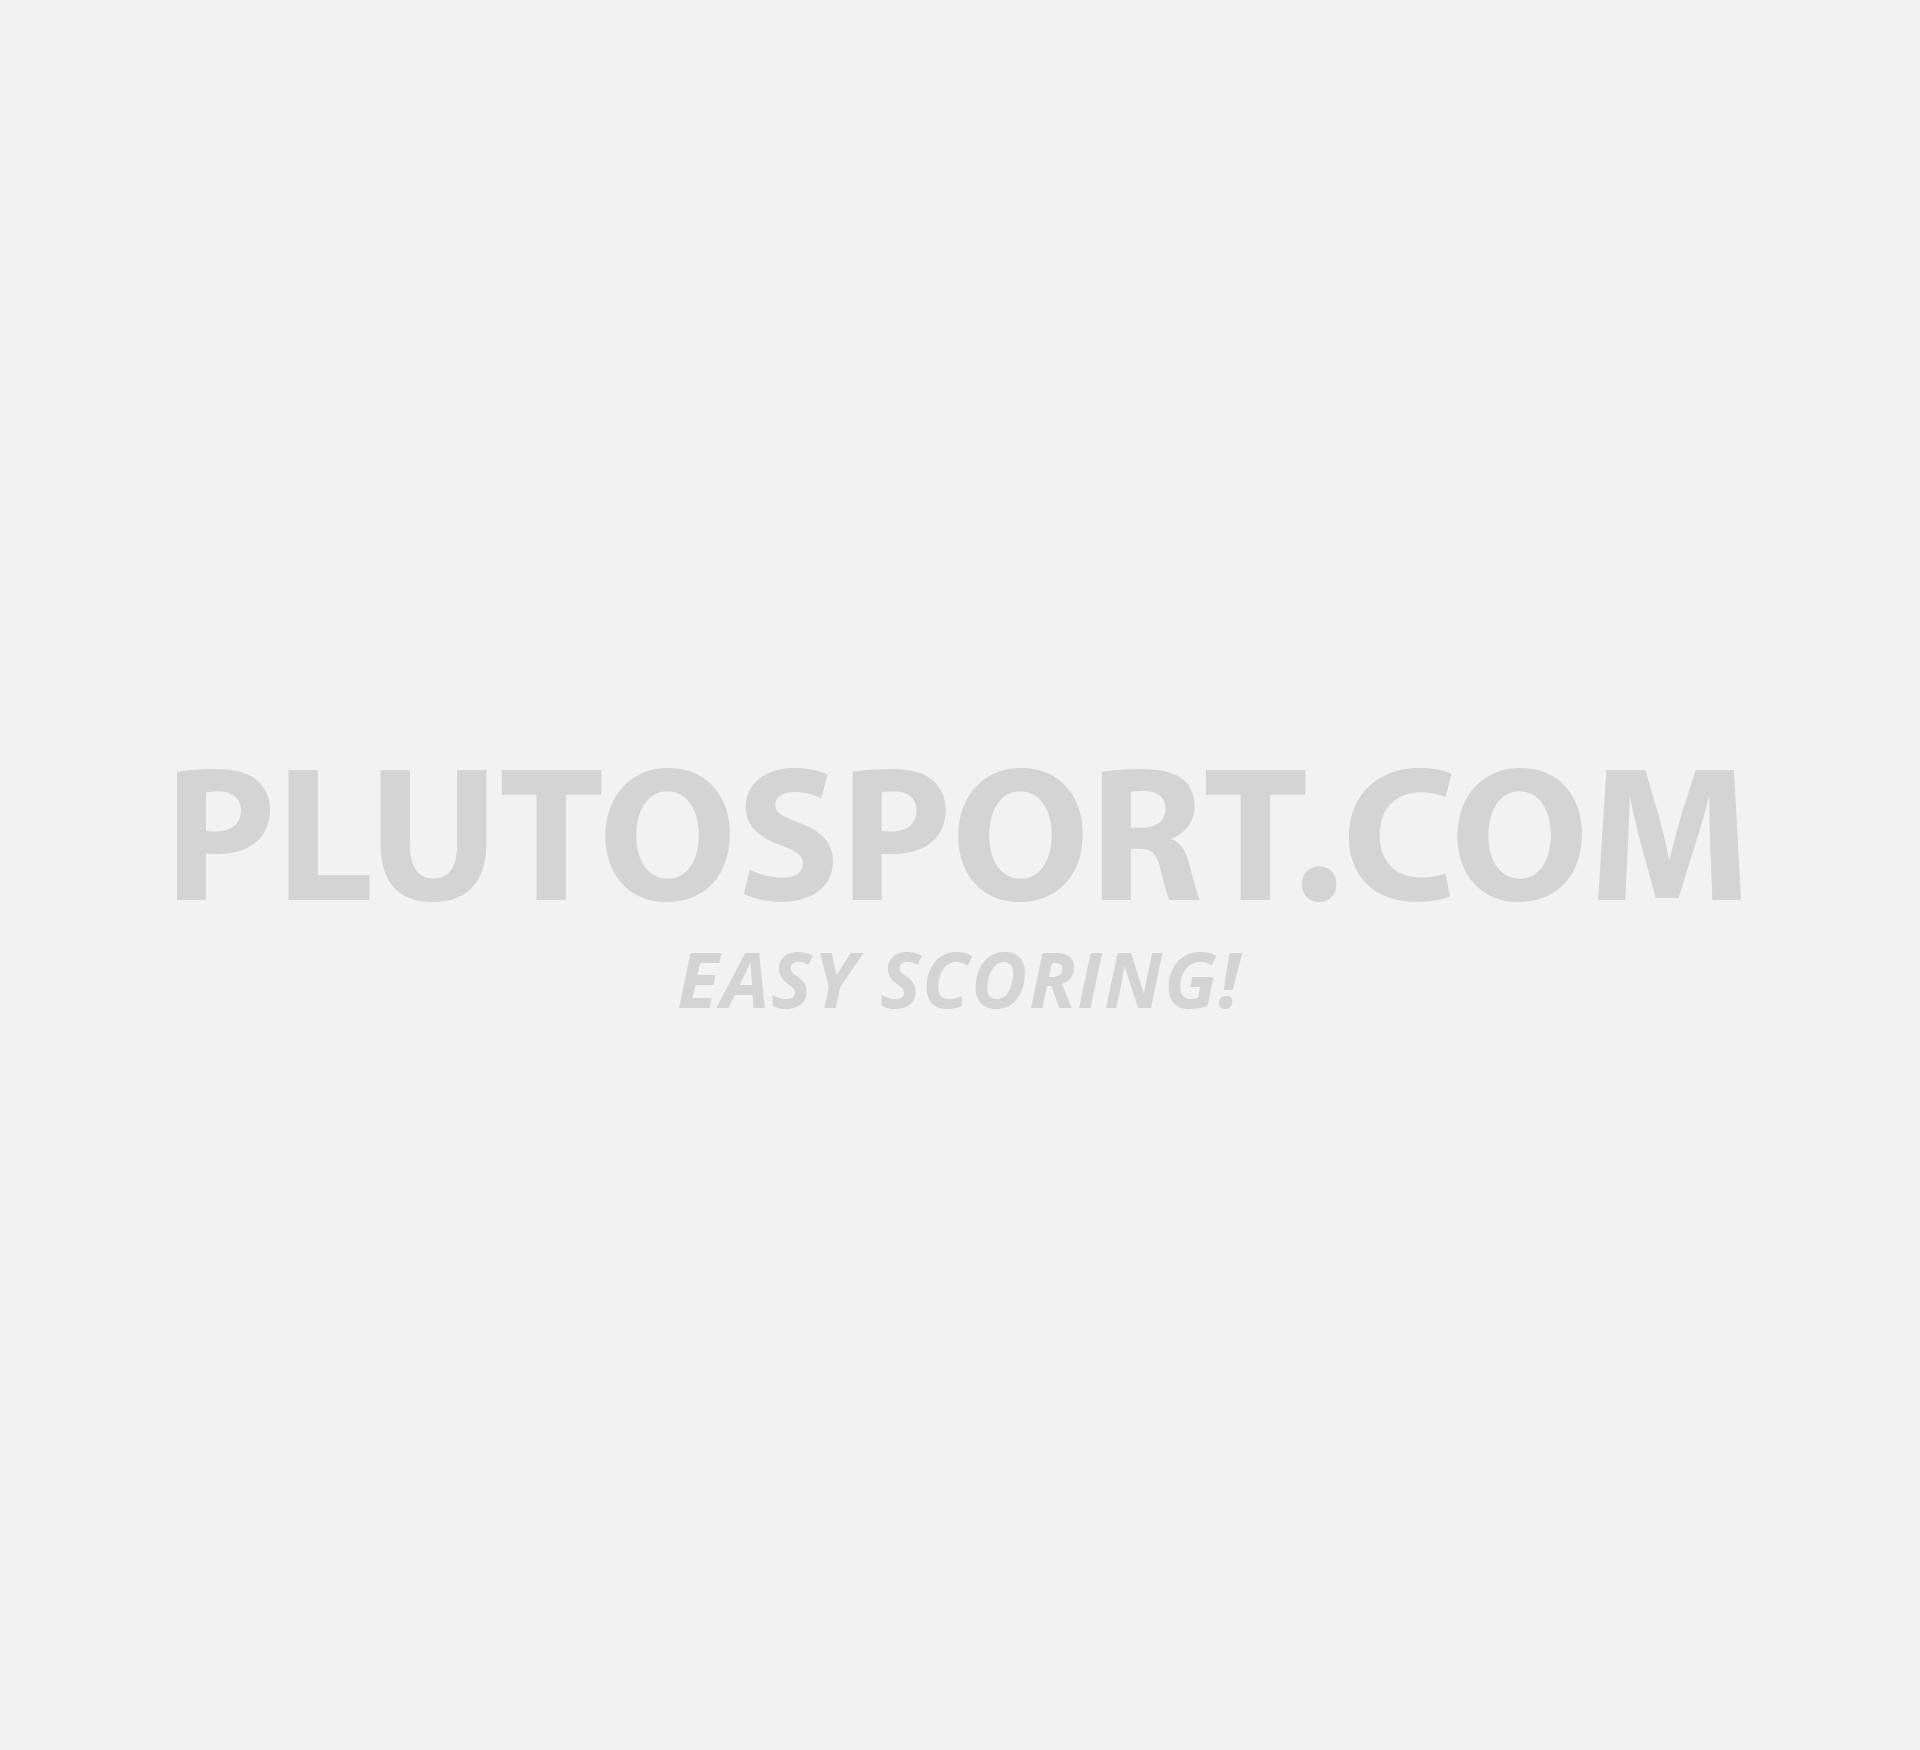 7d8edd9d3324 Adidas F50 adiZero TRX FG. 0 Review(s). Add to Wishlist. Availability: Out  of stock